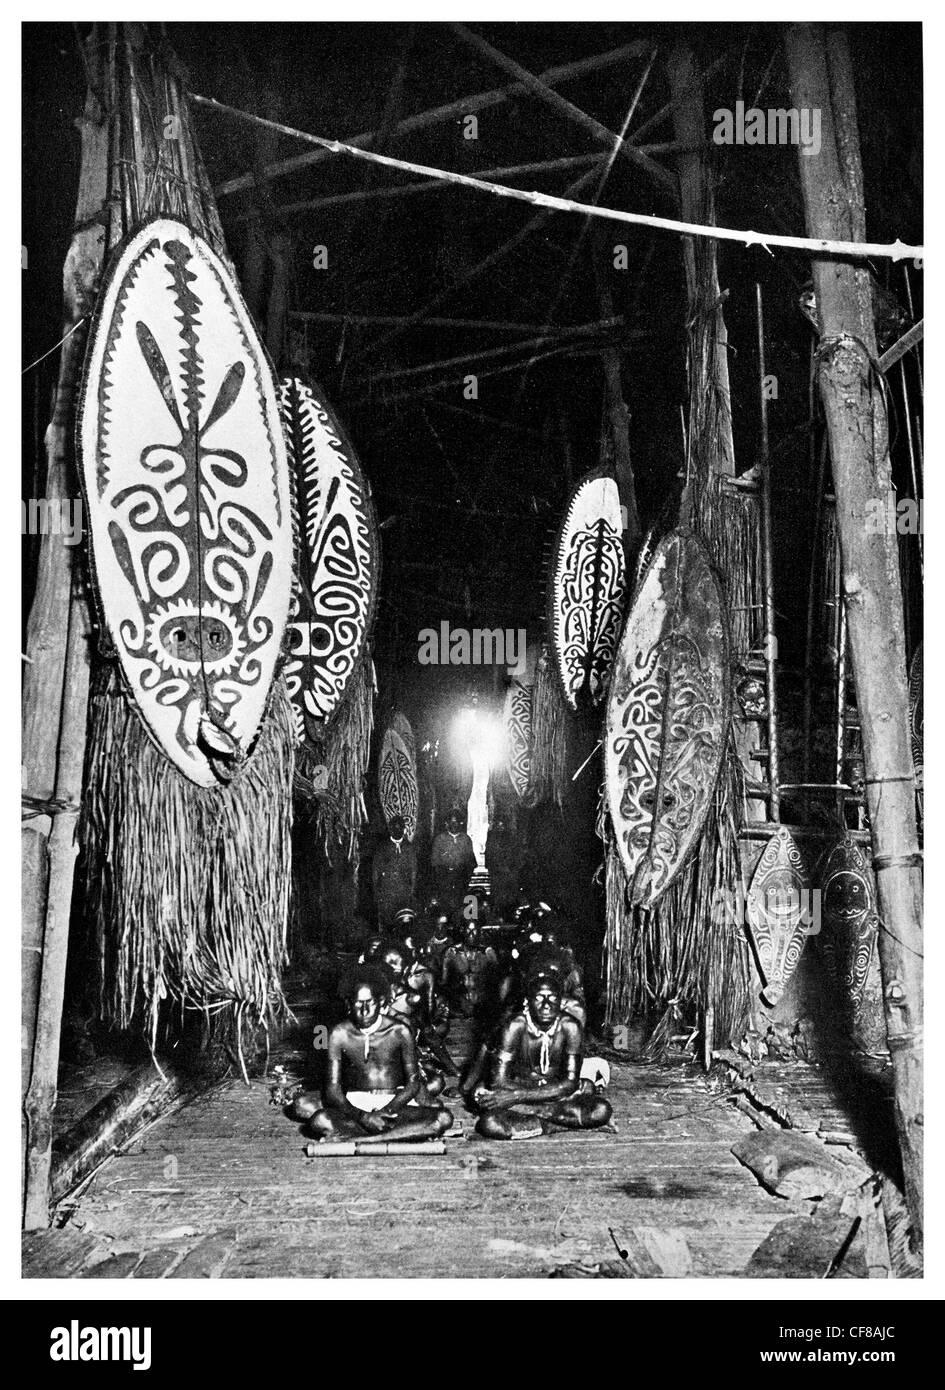 Dubu clubhouse masks shields weapons skull rack 1927 Papua New Guinea - Stock Image